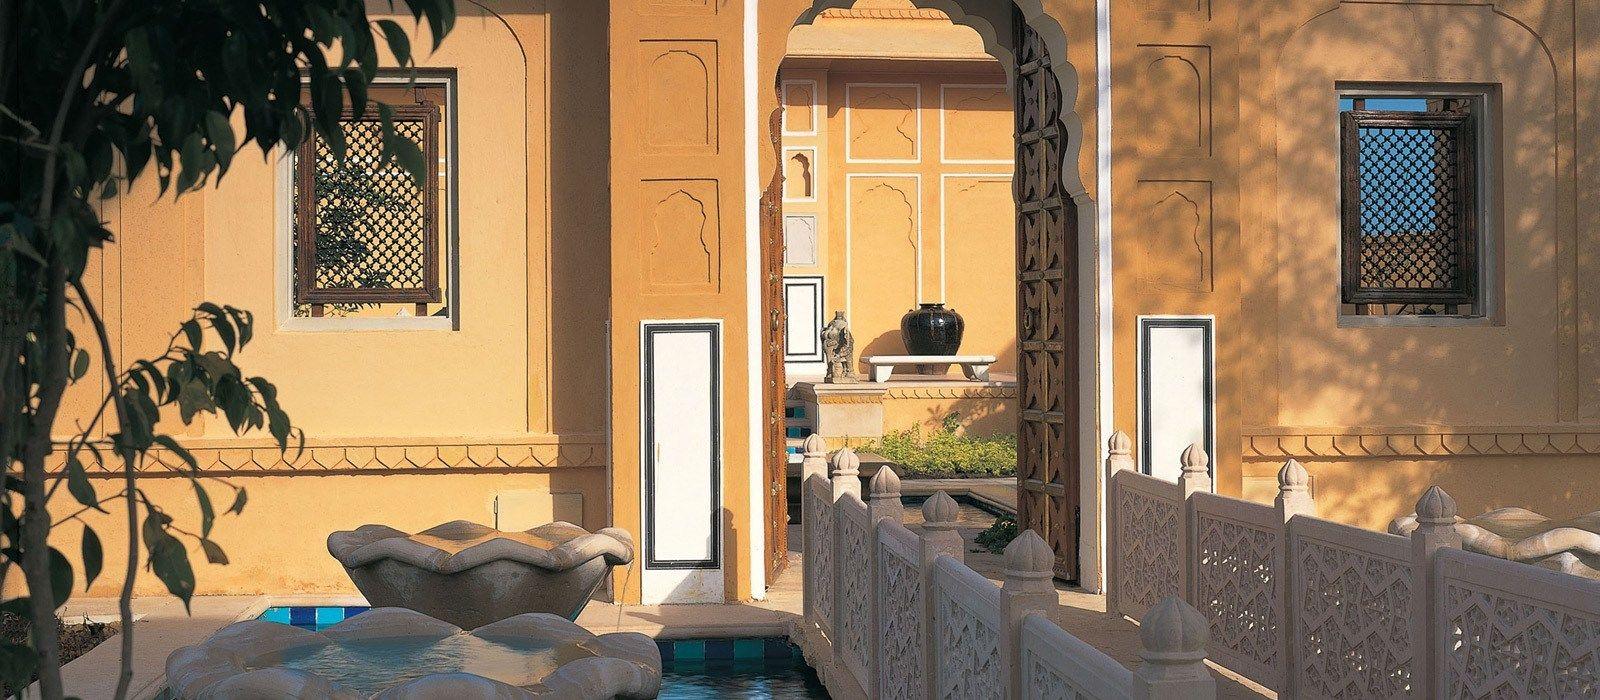 Hotel The Oberoi Rajvilas North India